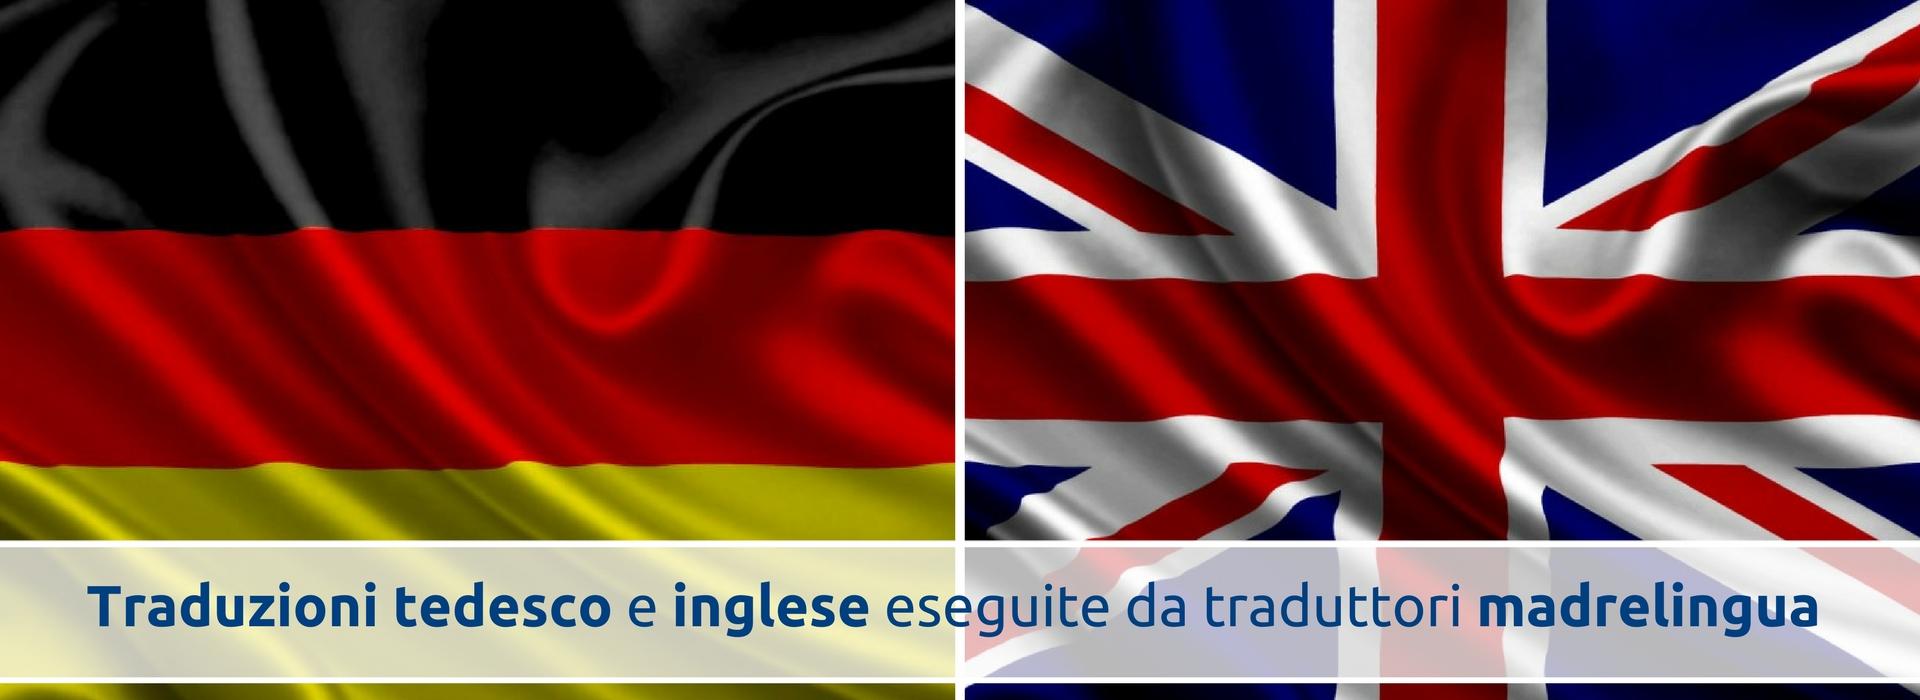 traduzioni-tedesco-inglese-roma